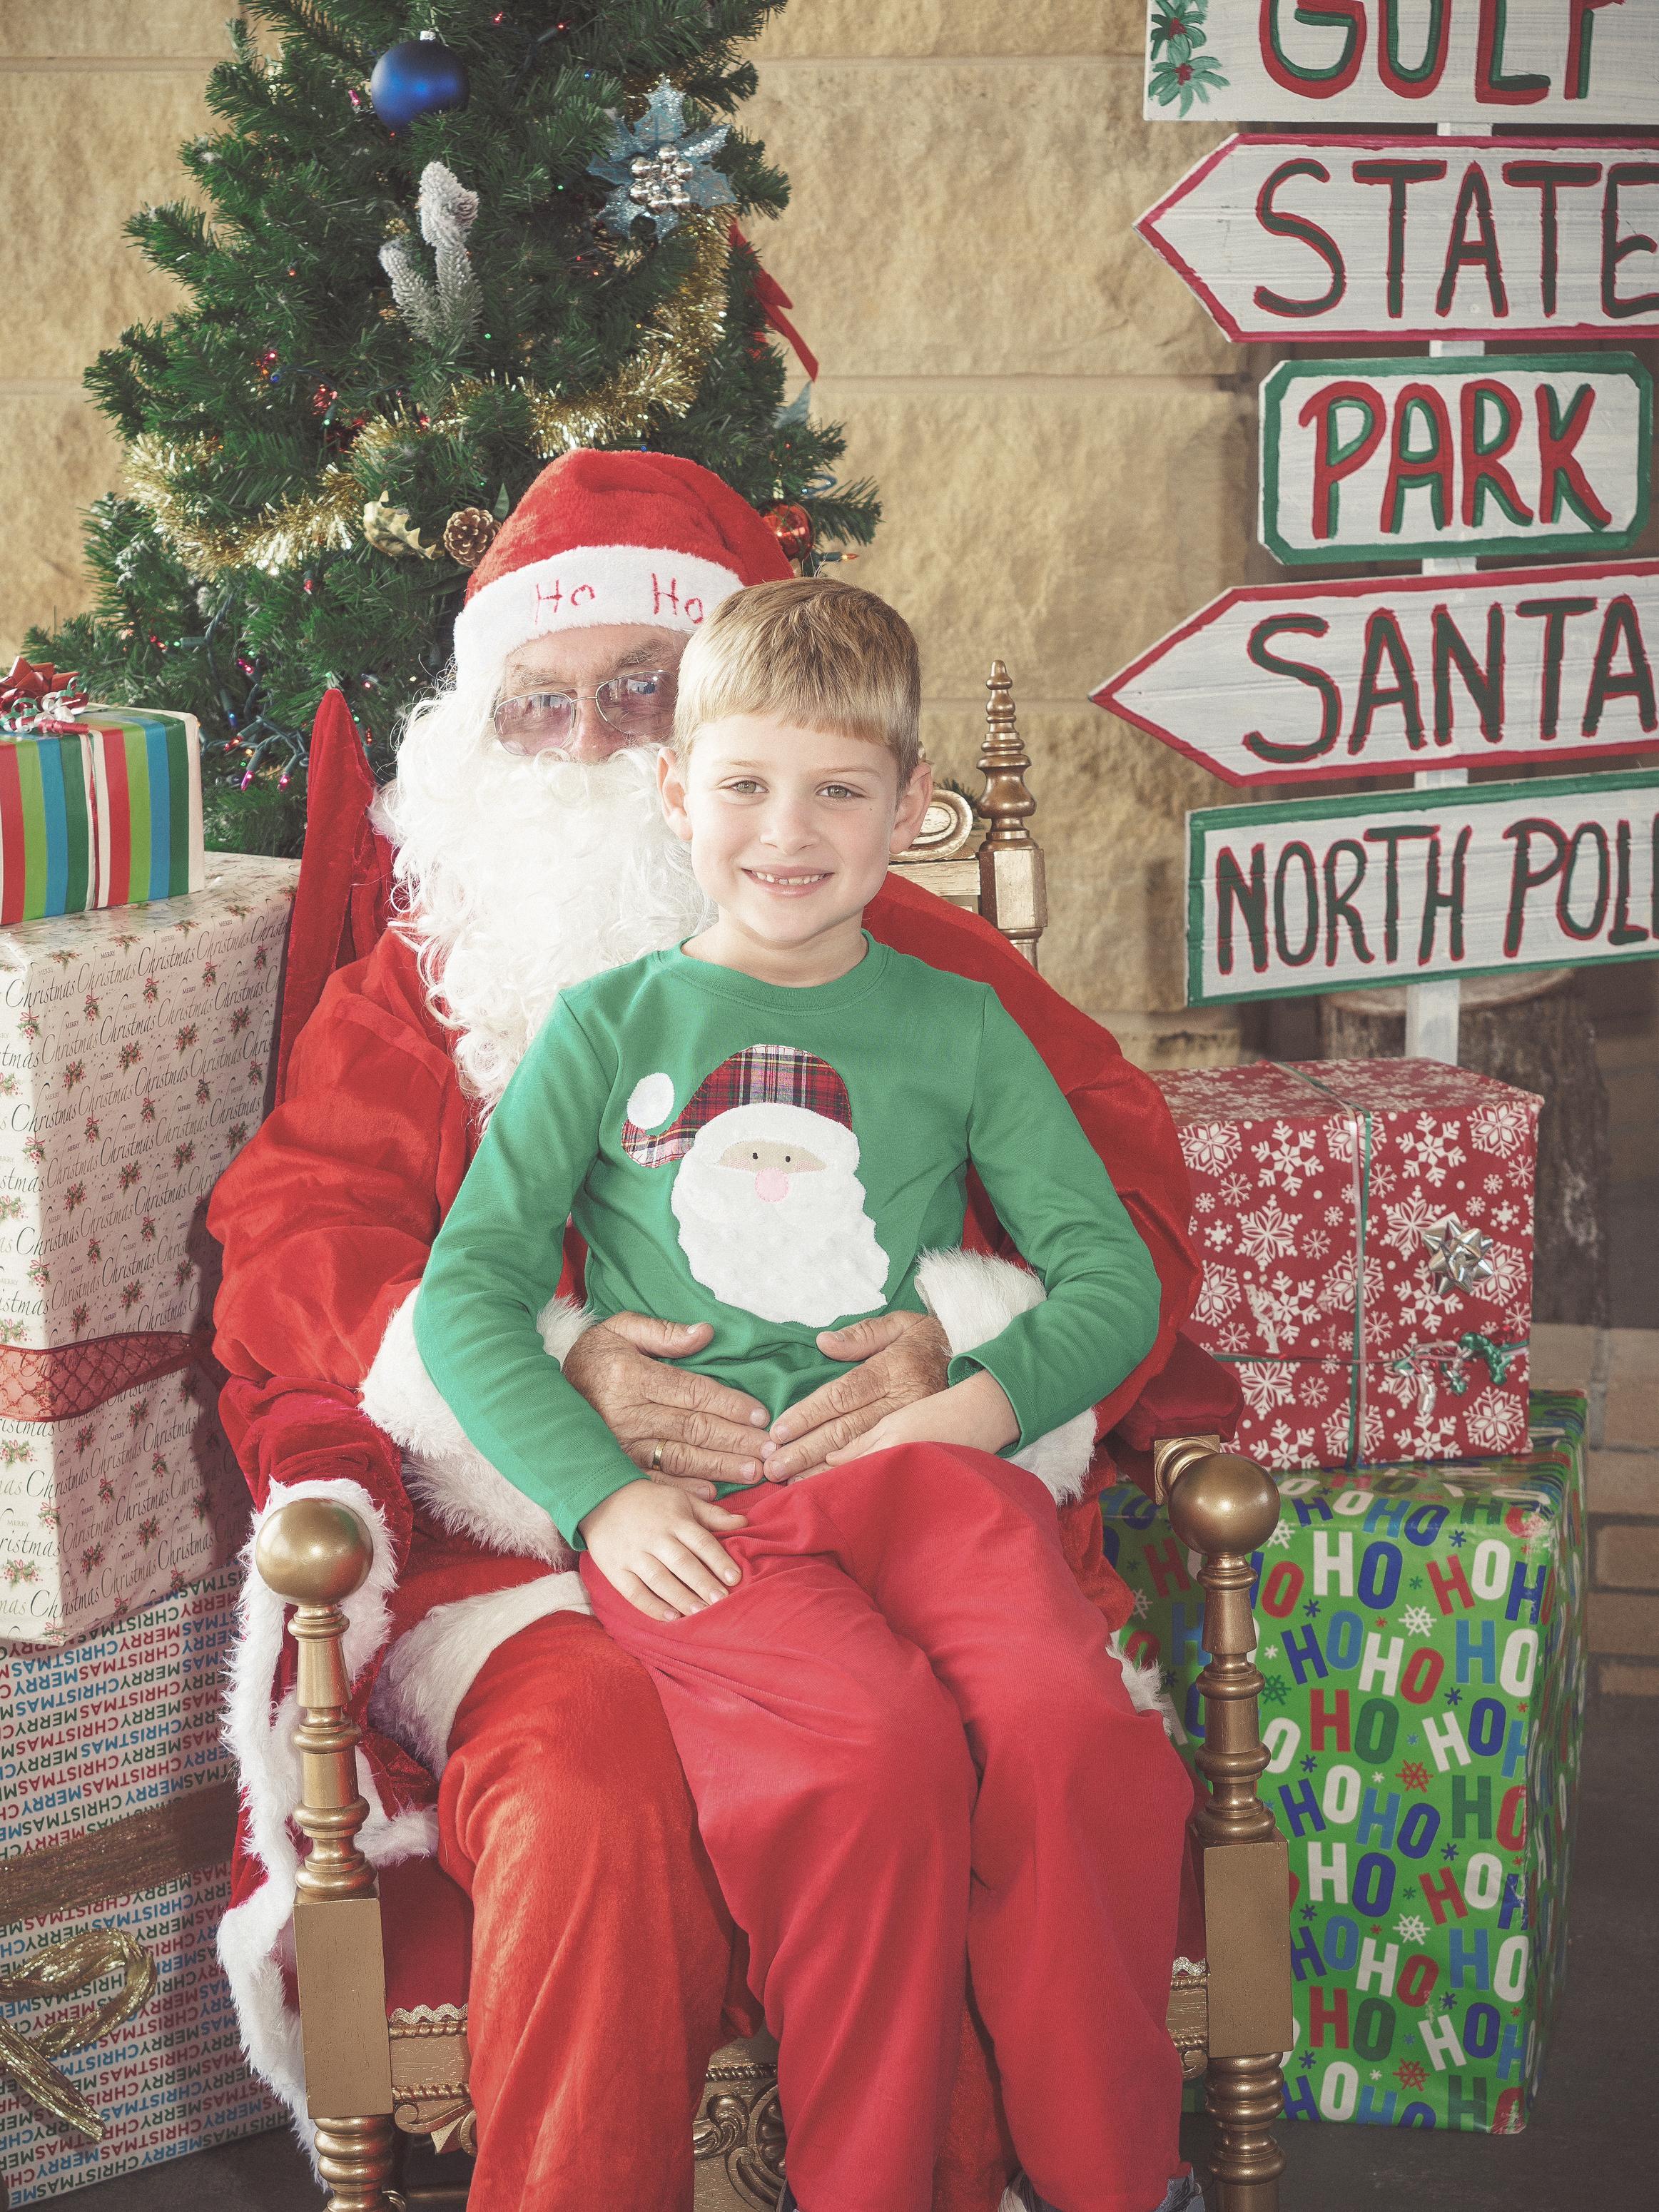 Coastal-Christmas-2017-Gulf-State-Park-Beach-Pavilion-003